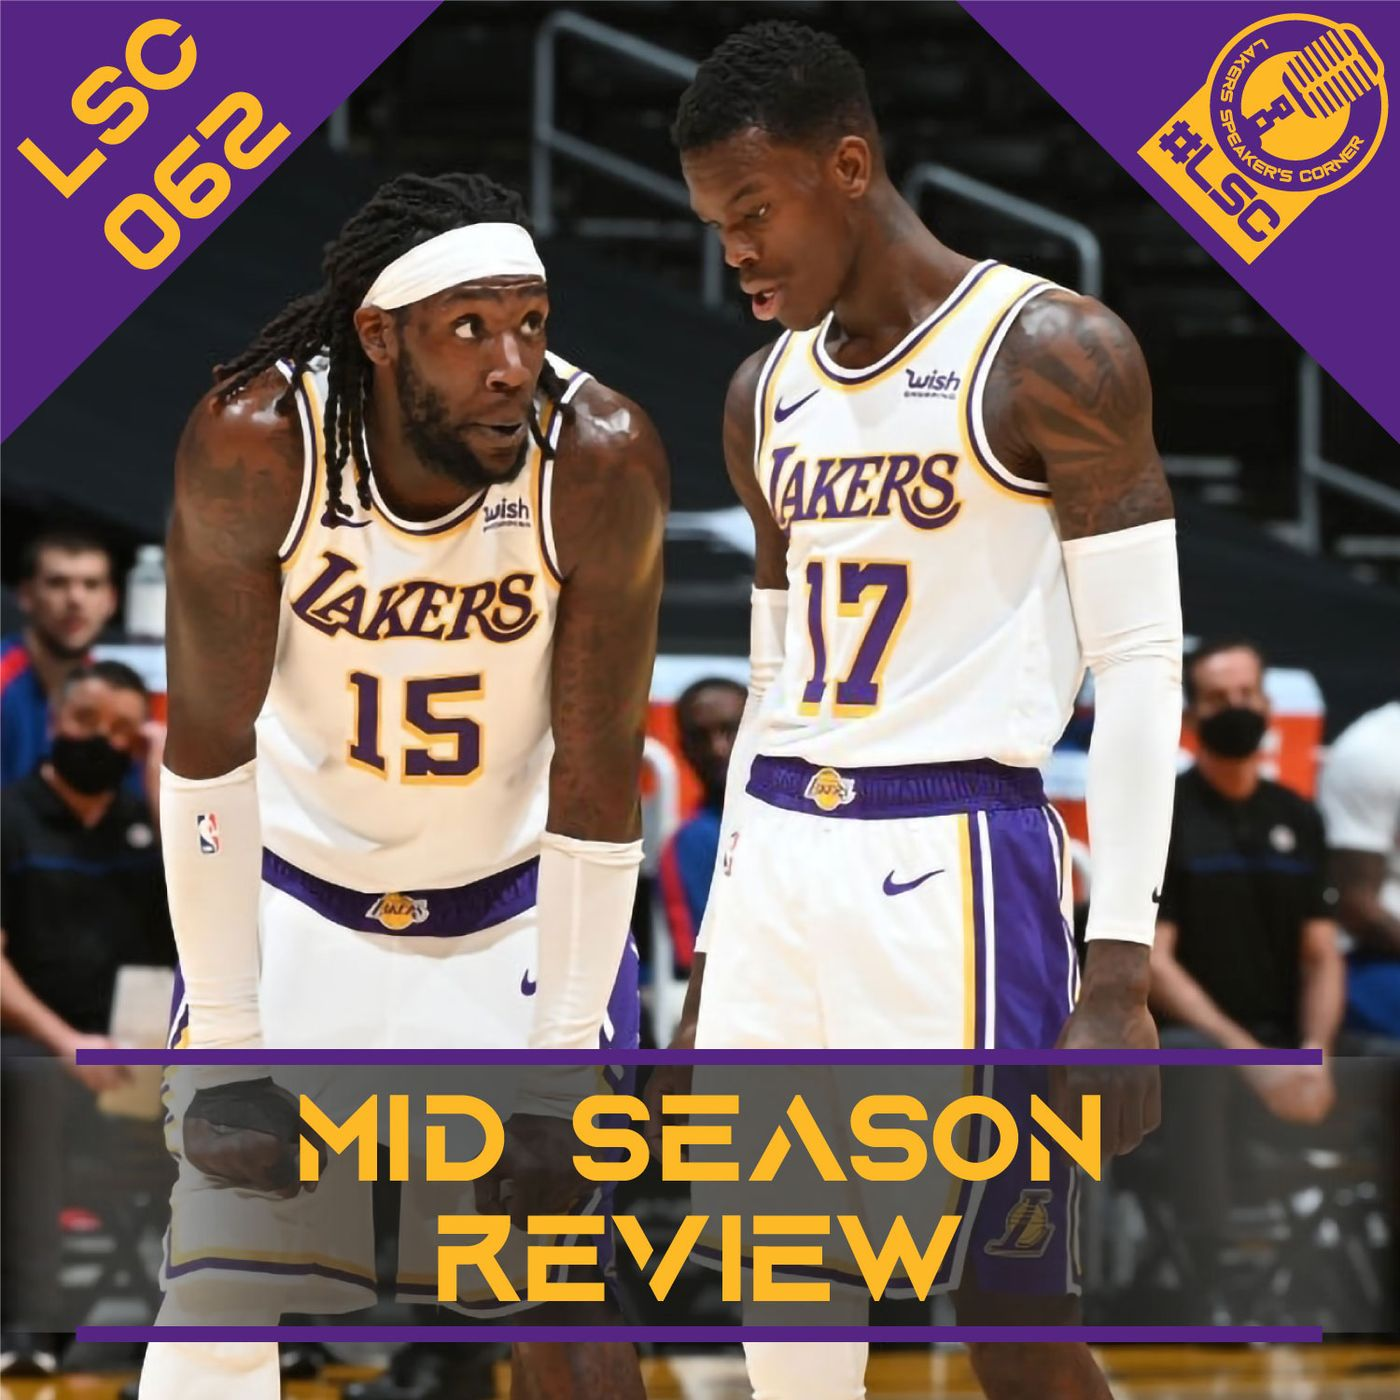 LSC 062 - Mid Season Review